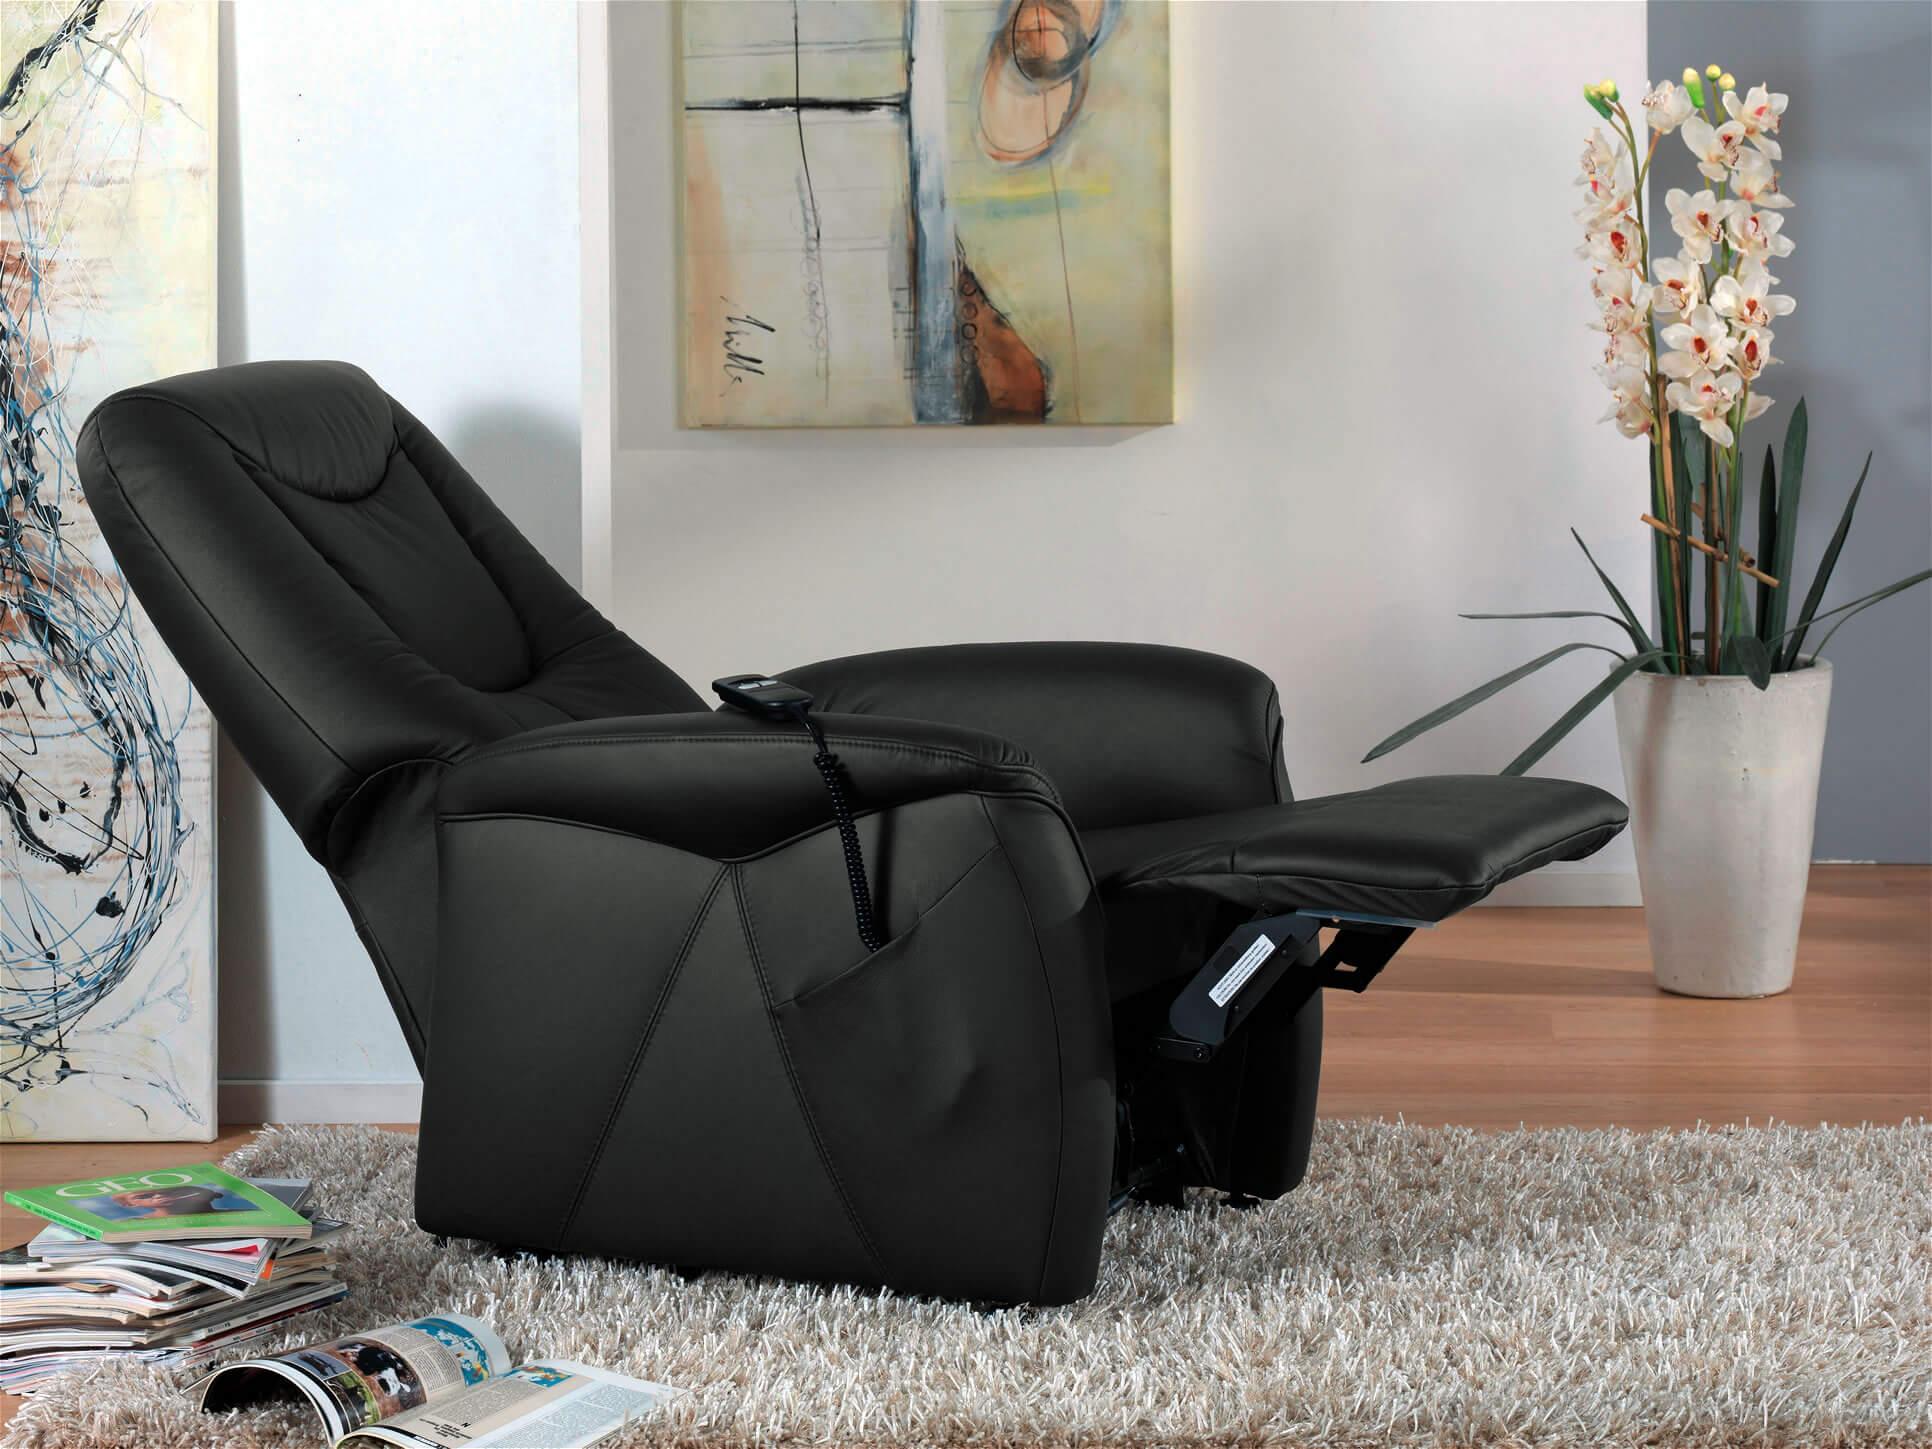 Himolla Relaxsessel 9771 26 Y Zweimotorisch Leder Torro Möbel